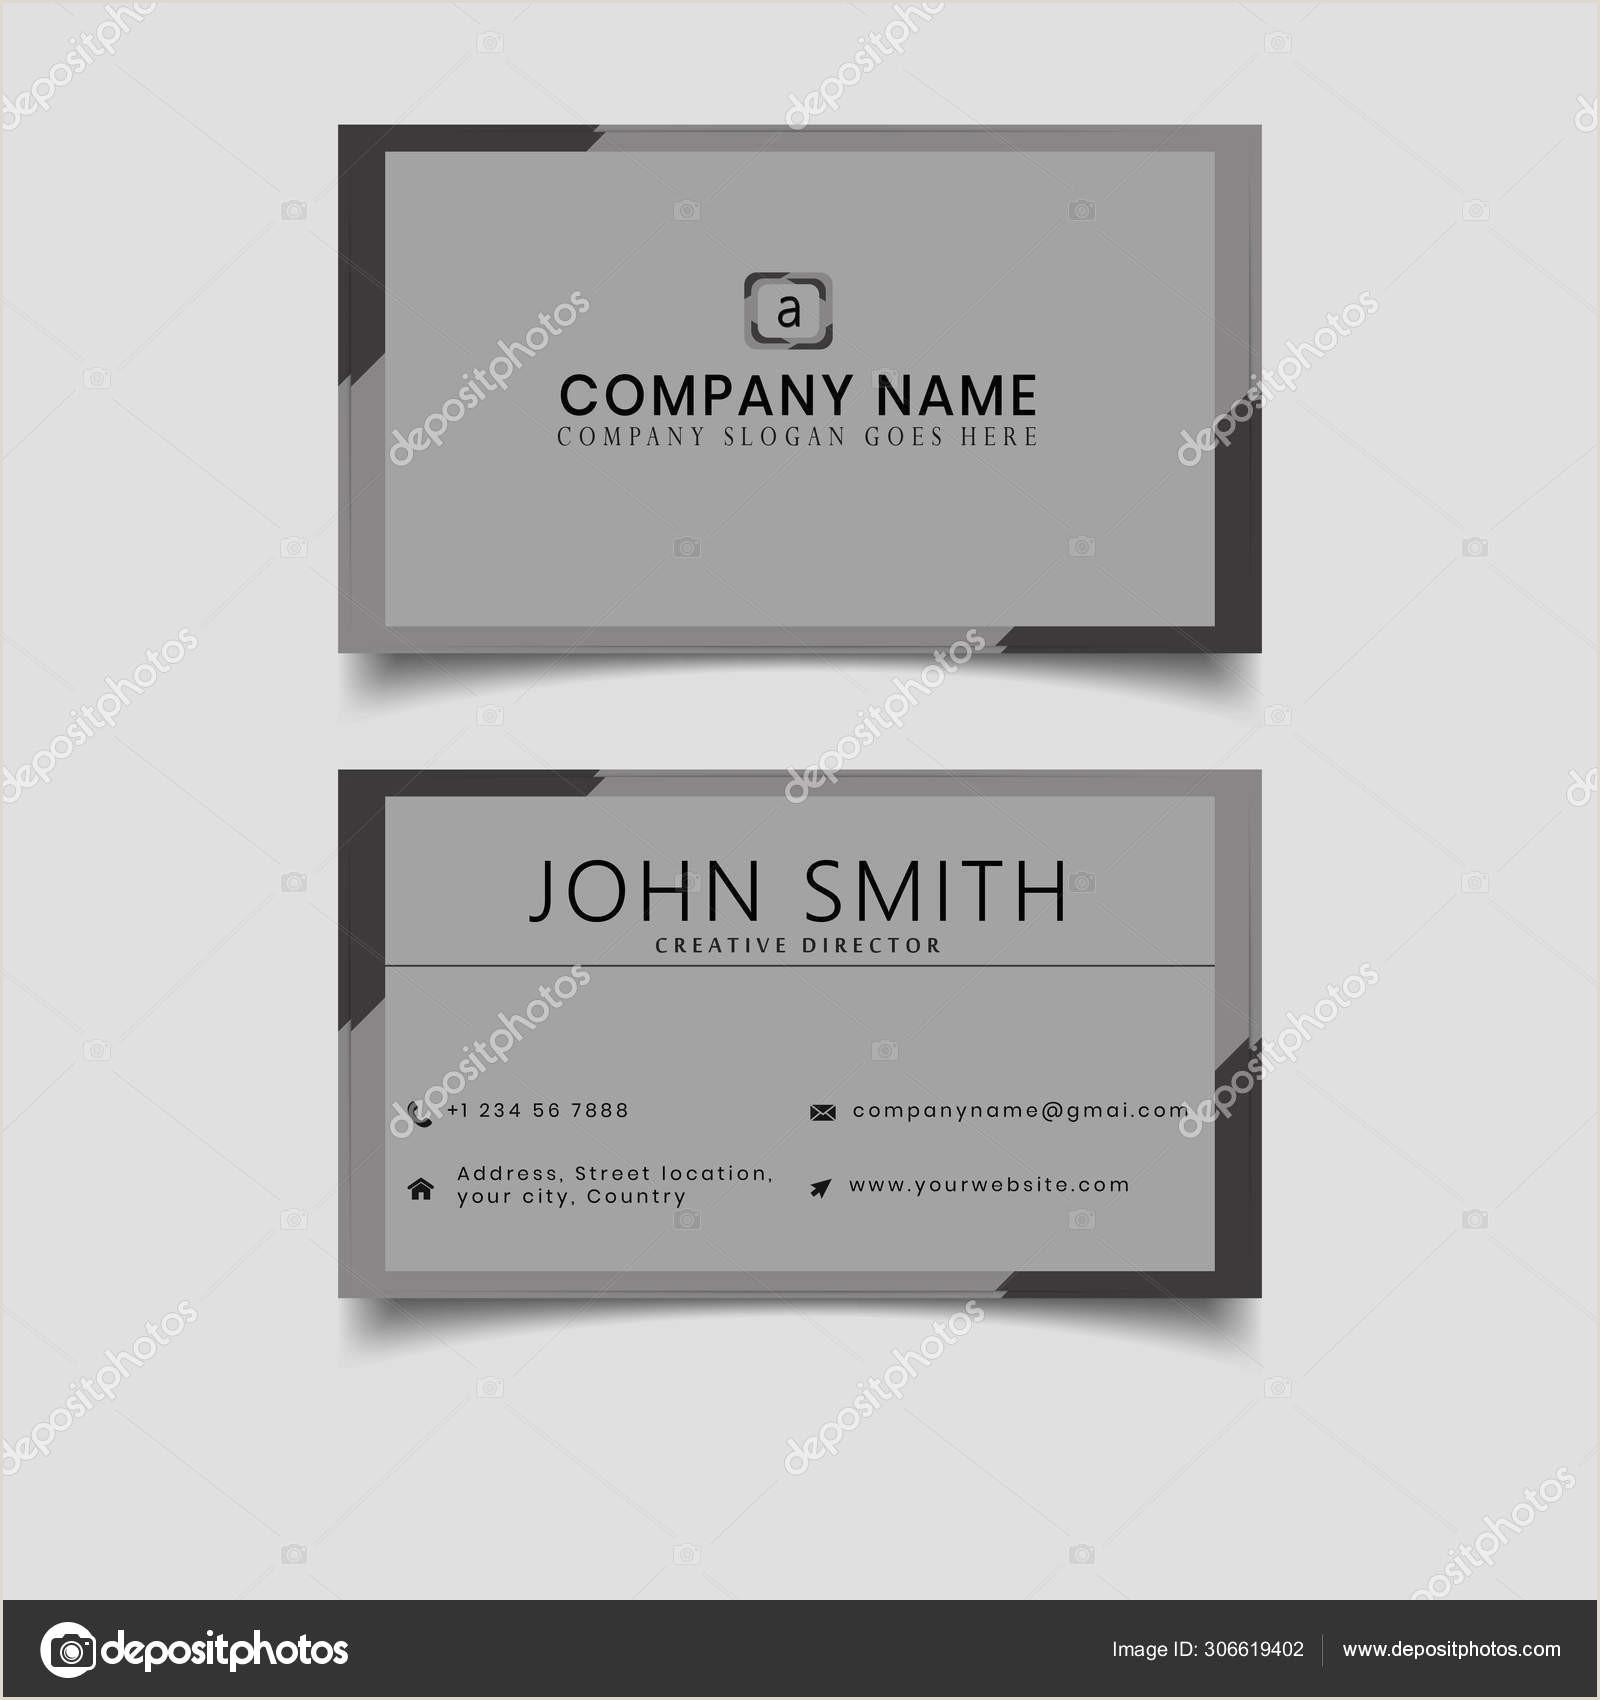 Unique Business Cards' Black Grey Business Card Modern Design Vector Layout